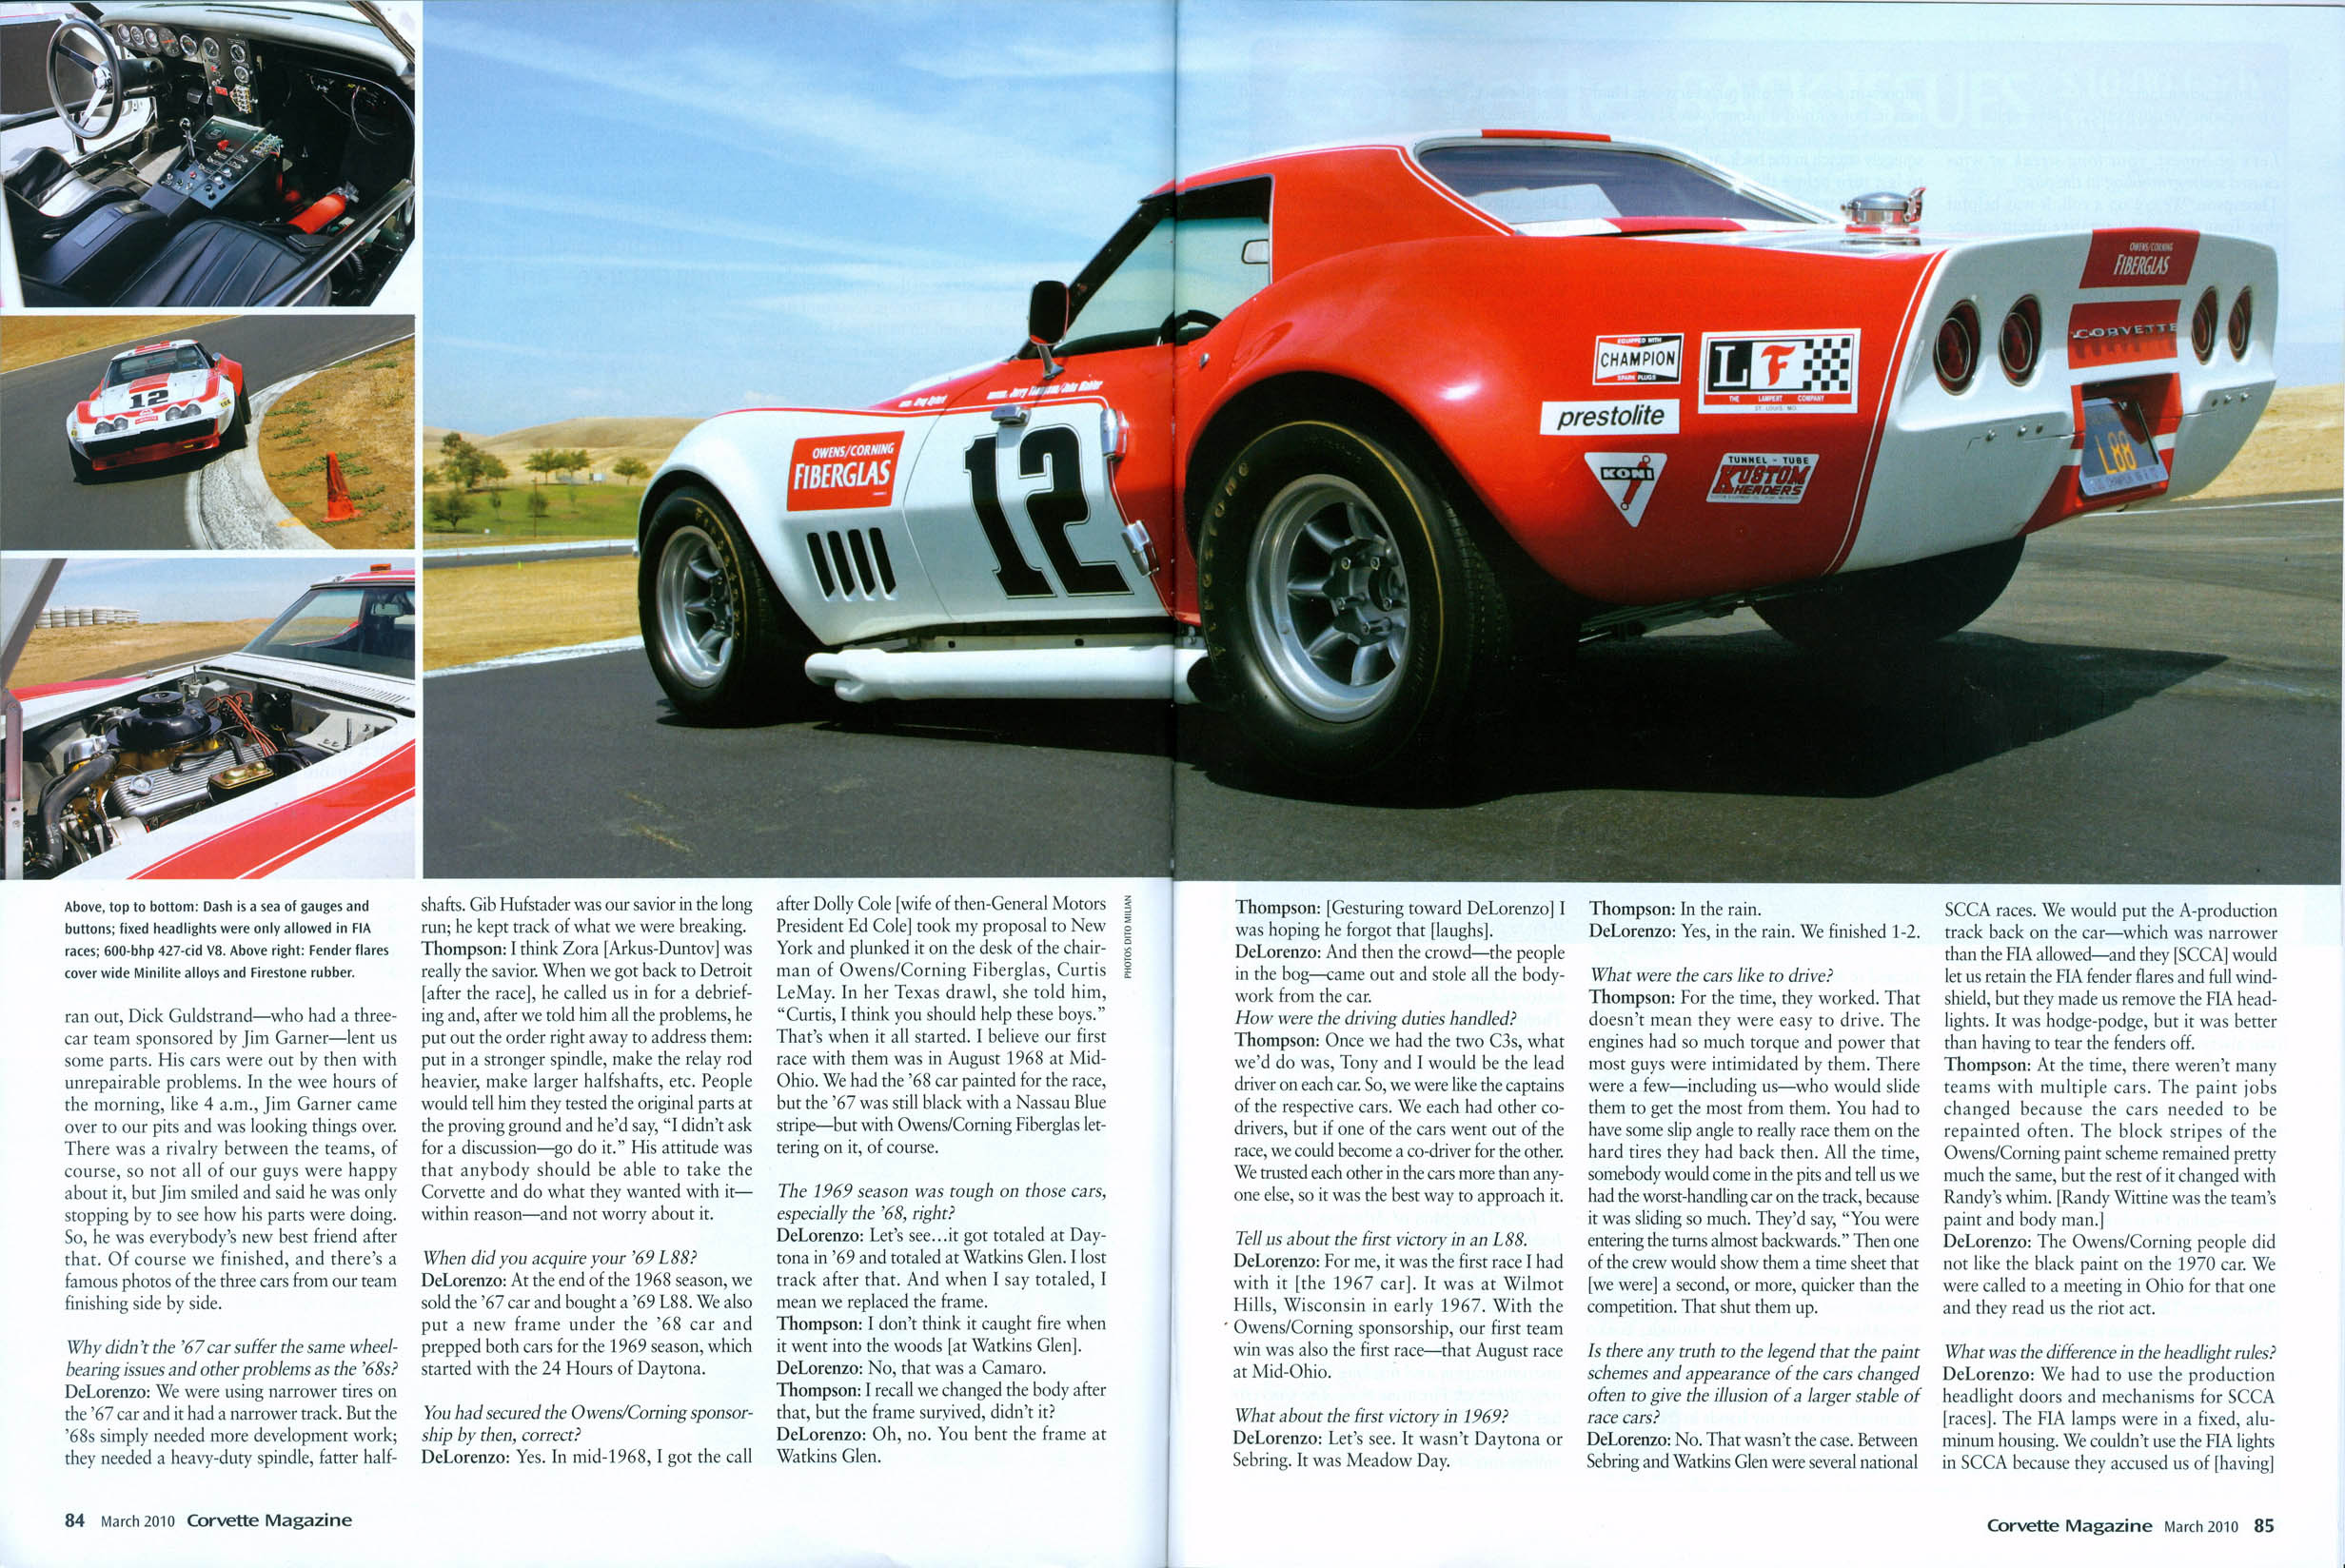 CorvetteMagazineMarch2010_5